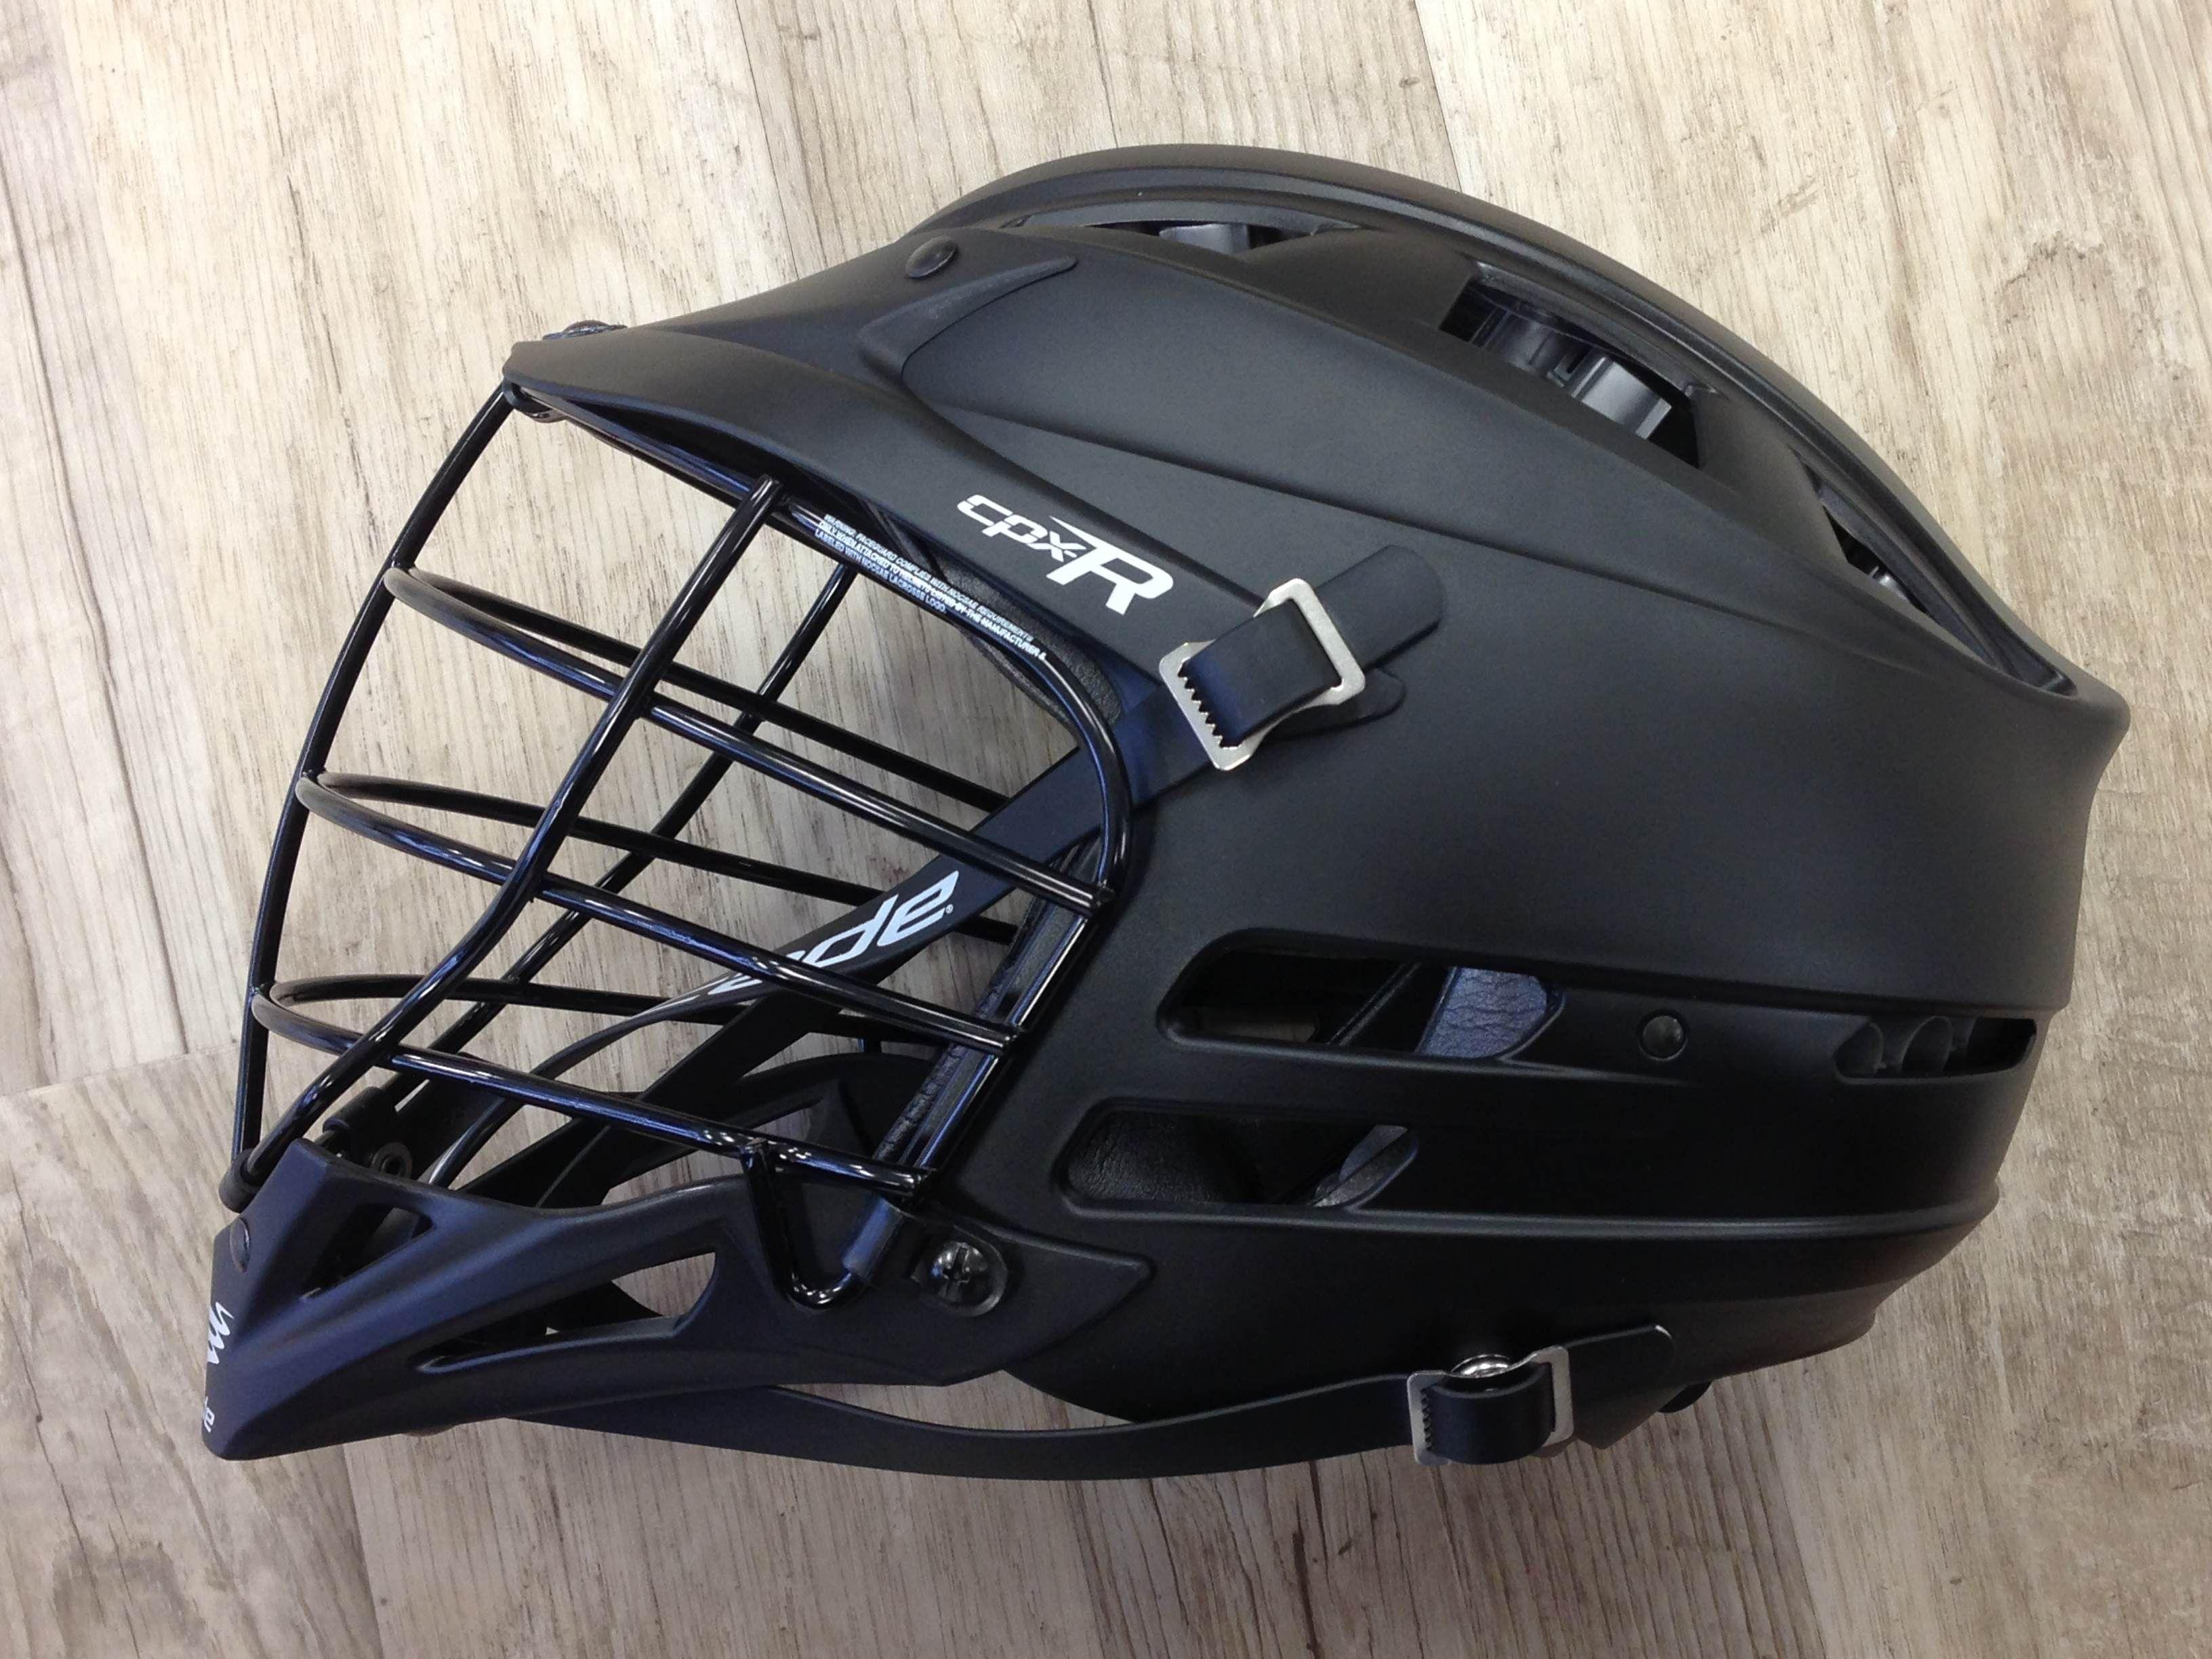 Cascade CPXR Matte Black Lacrosse Helmet is Now Available ...